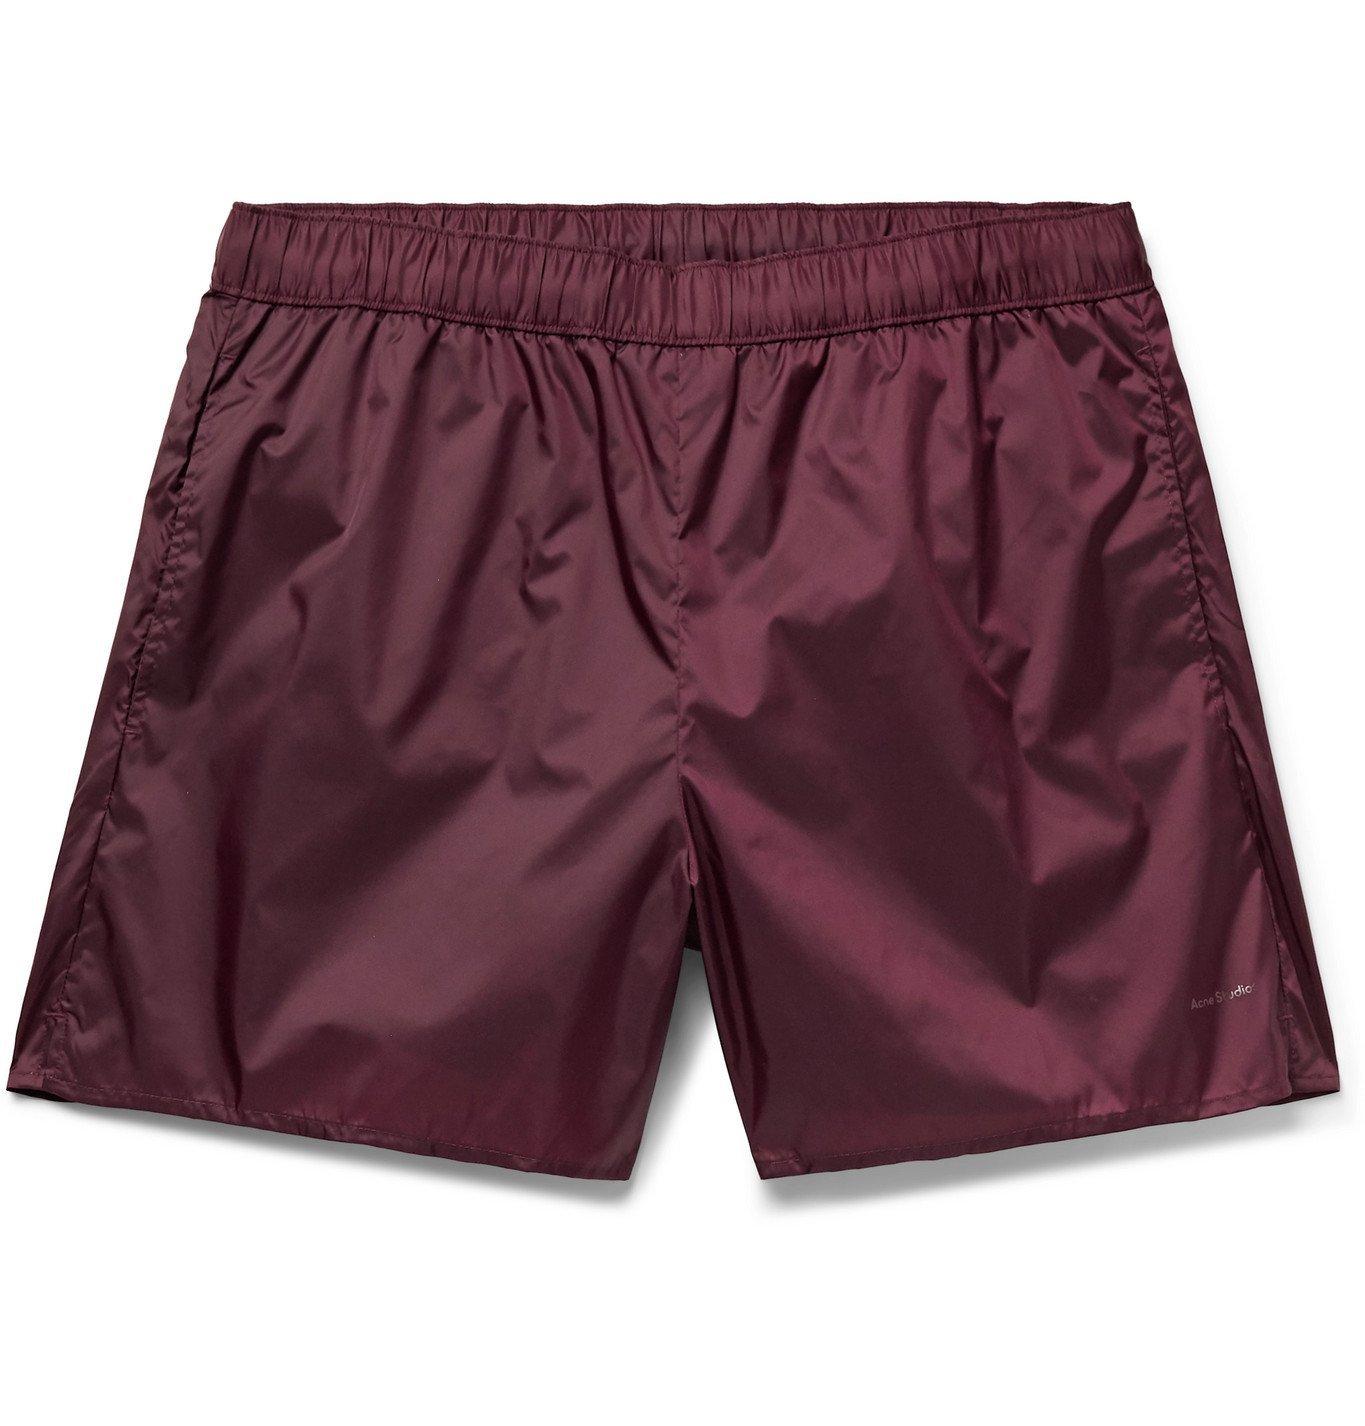 Acne Studios - Warrick Slim-Fit Mid-Length Swim Shorts - Burgundy